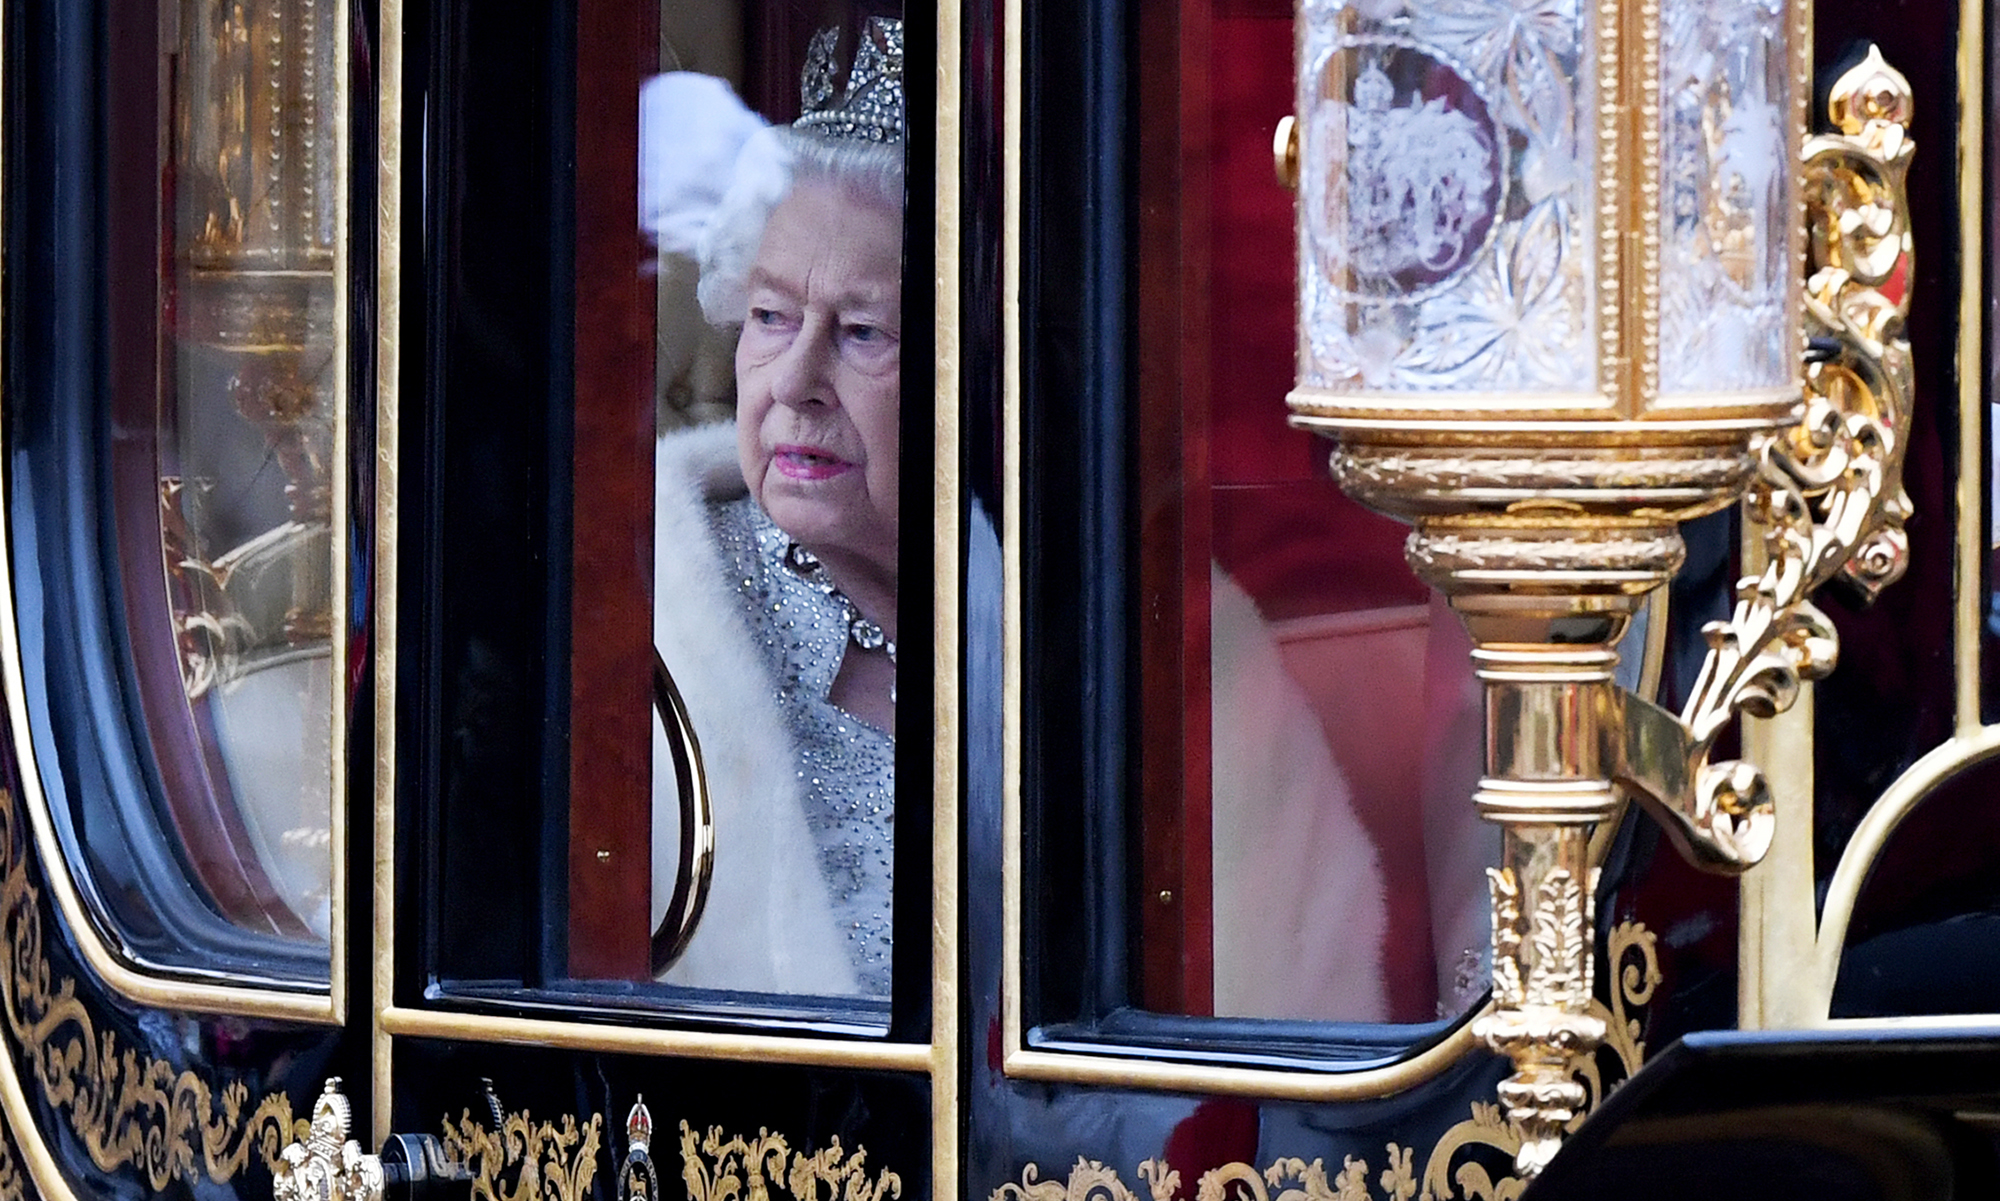 Declassified UK: New UK laws could criminalise journalism